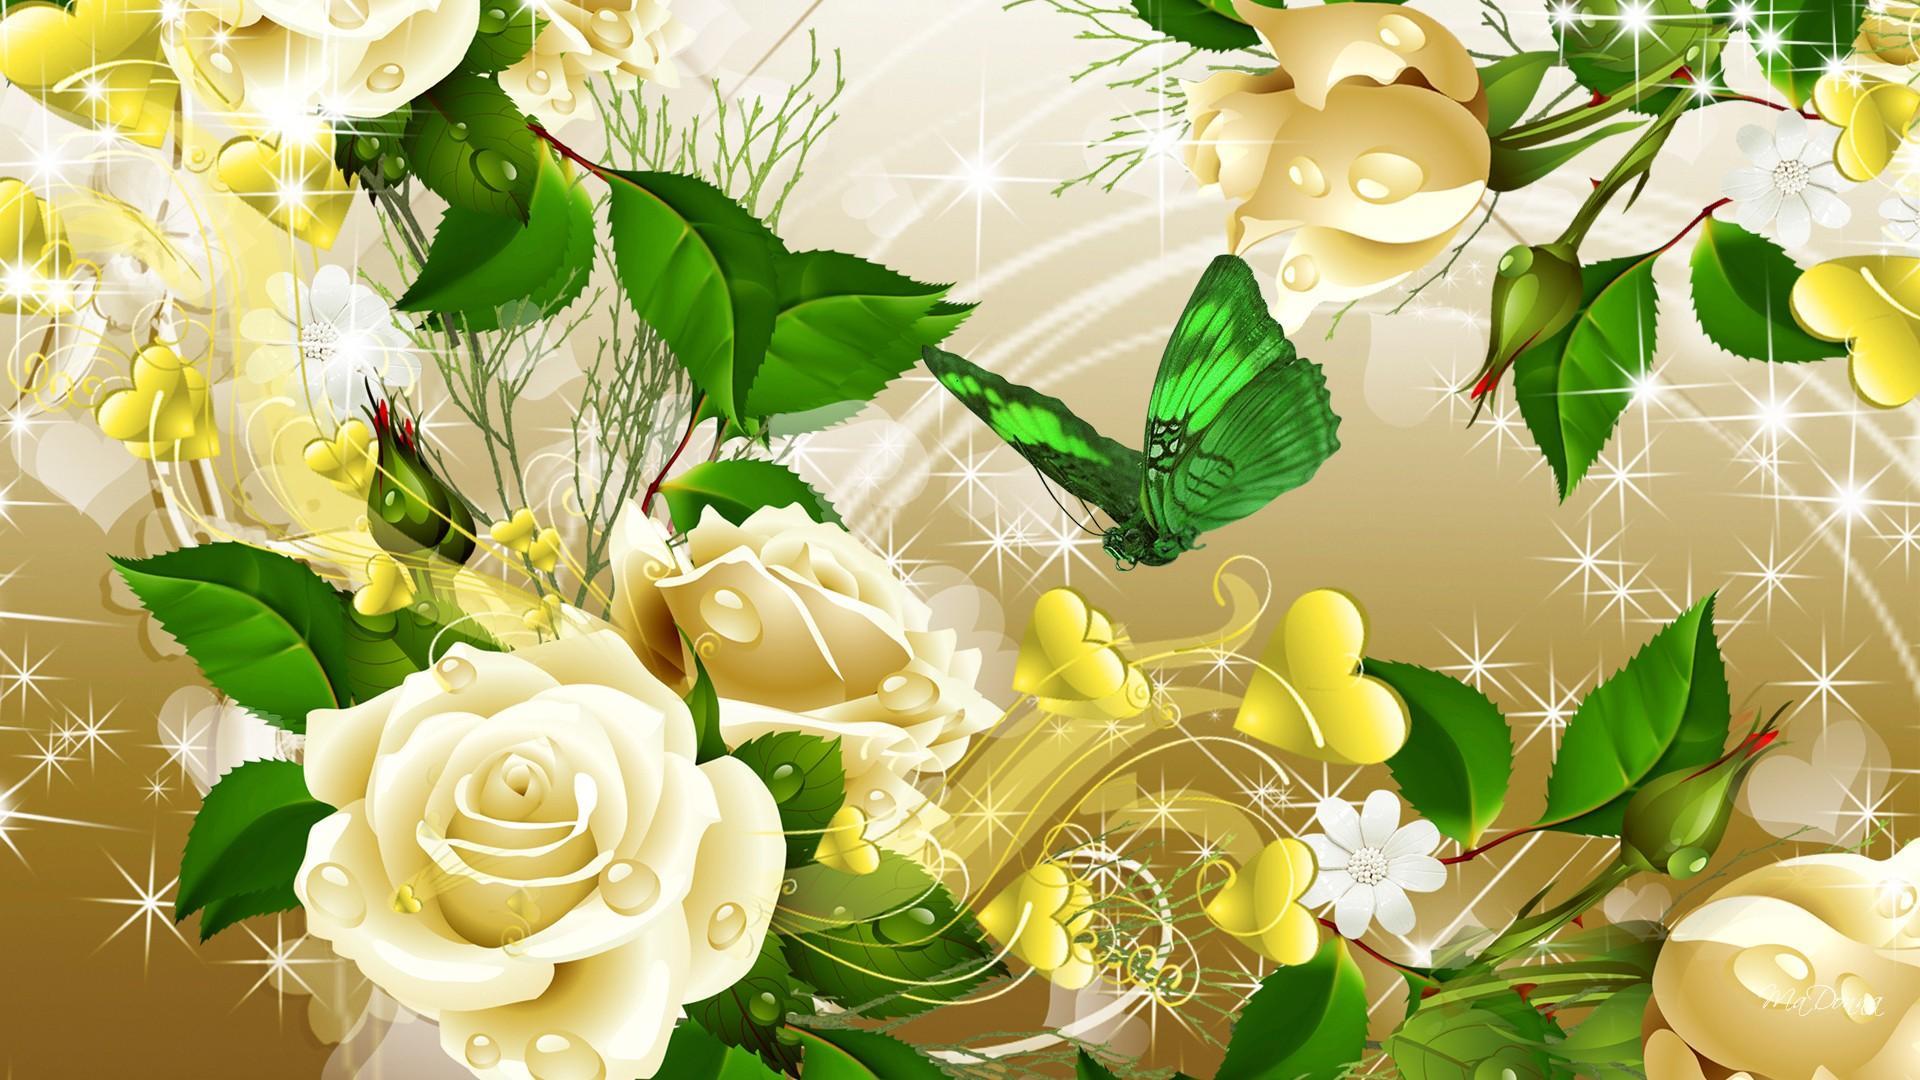 Yellow-Roses-keywords-HERE-1920×1080-Yellow-Rose-Image-Ado-wallpaper-wpc58010508